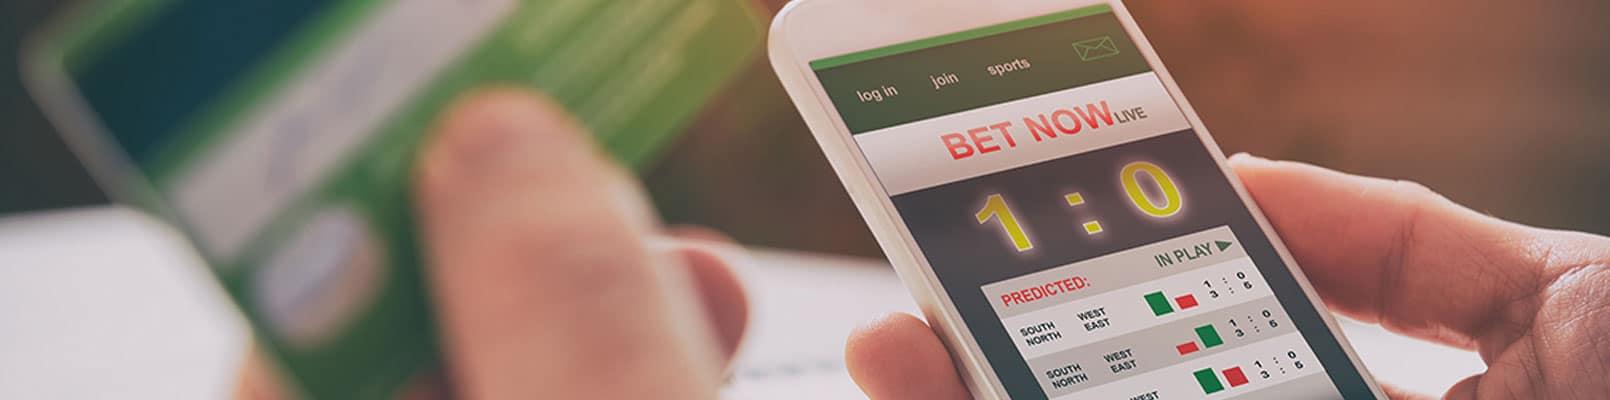 întrebări frecvente despre maxbet casino online